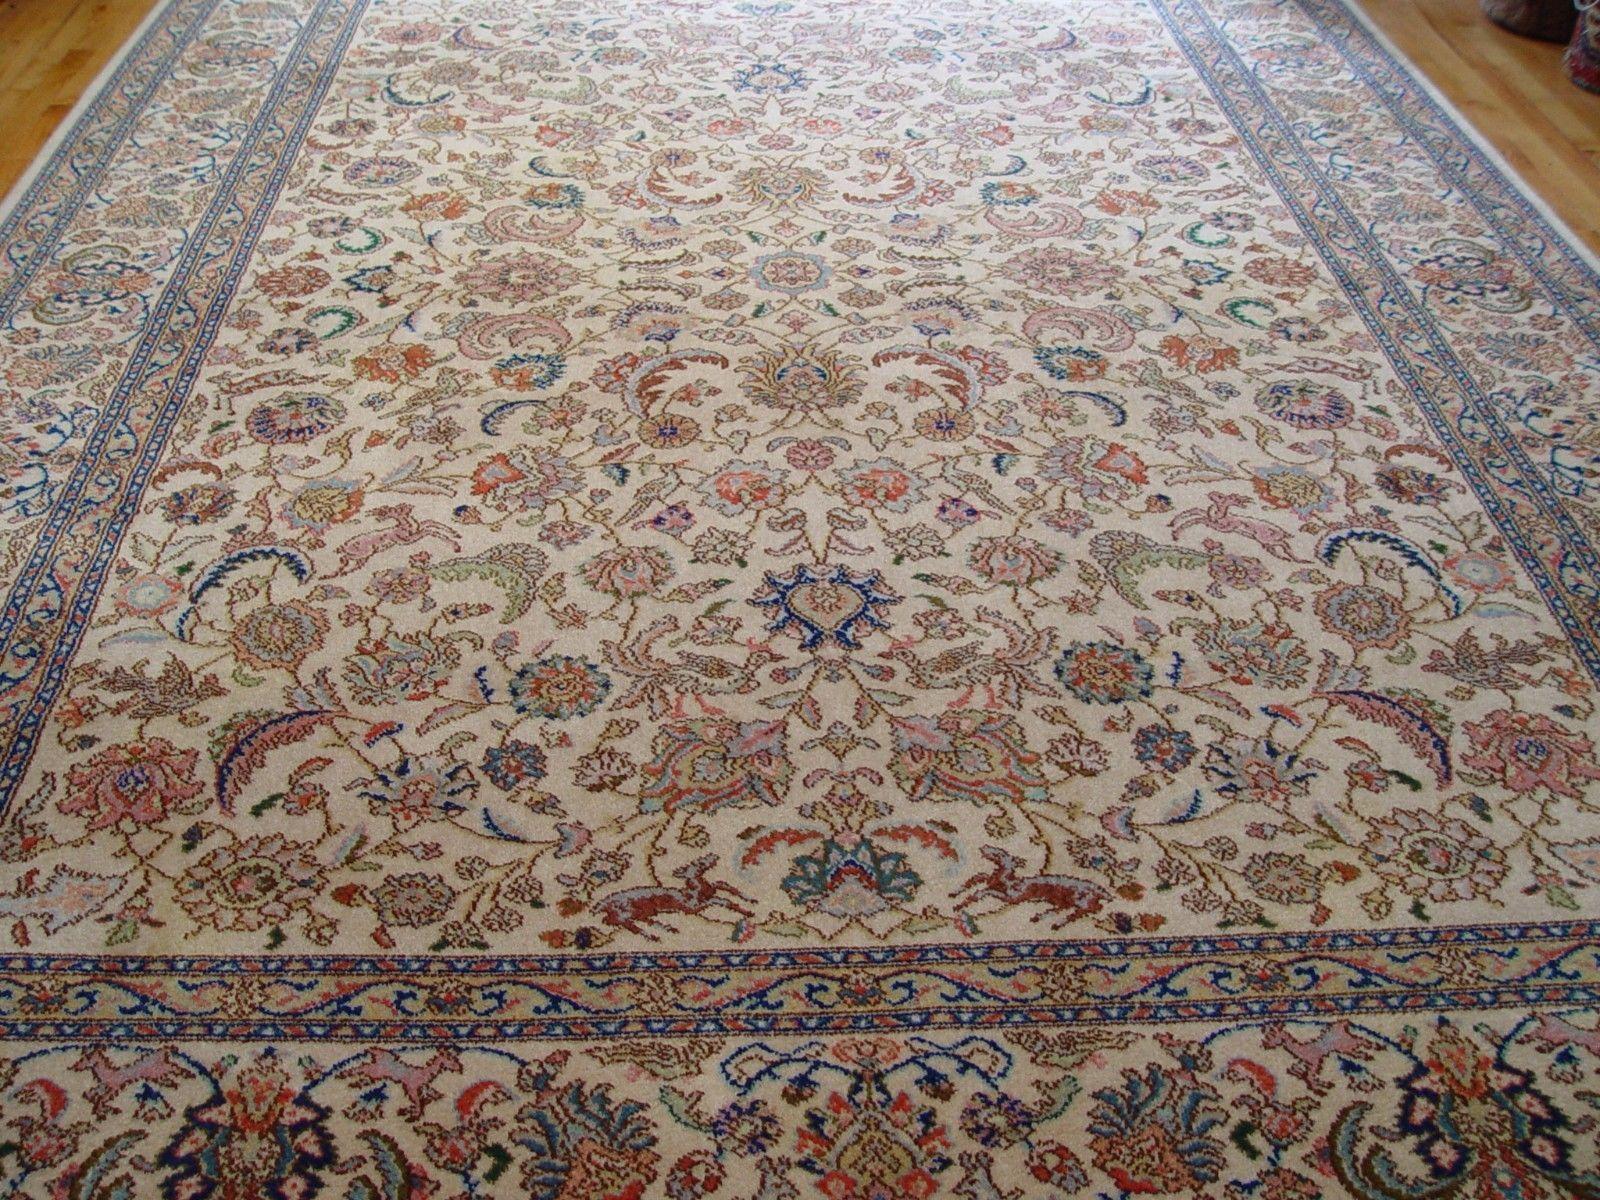 8 8 Quot X 12 Karastan Tabriz 738 Usa Wool Area Rug Hand